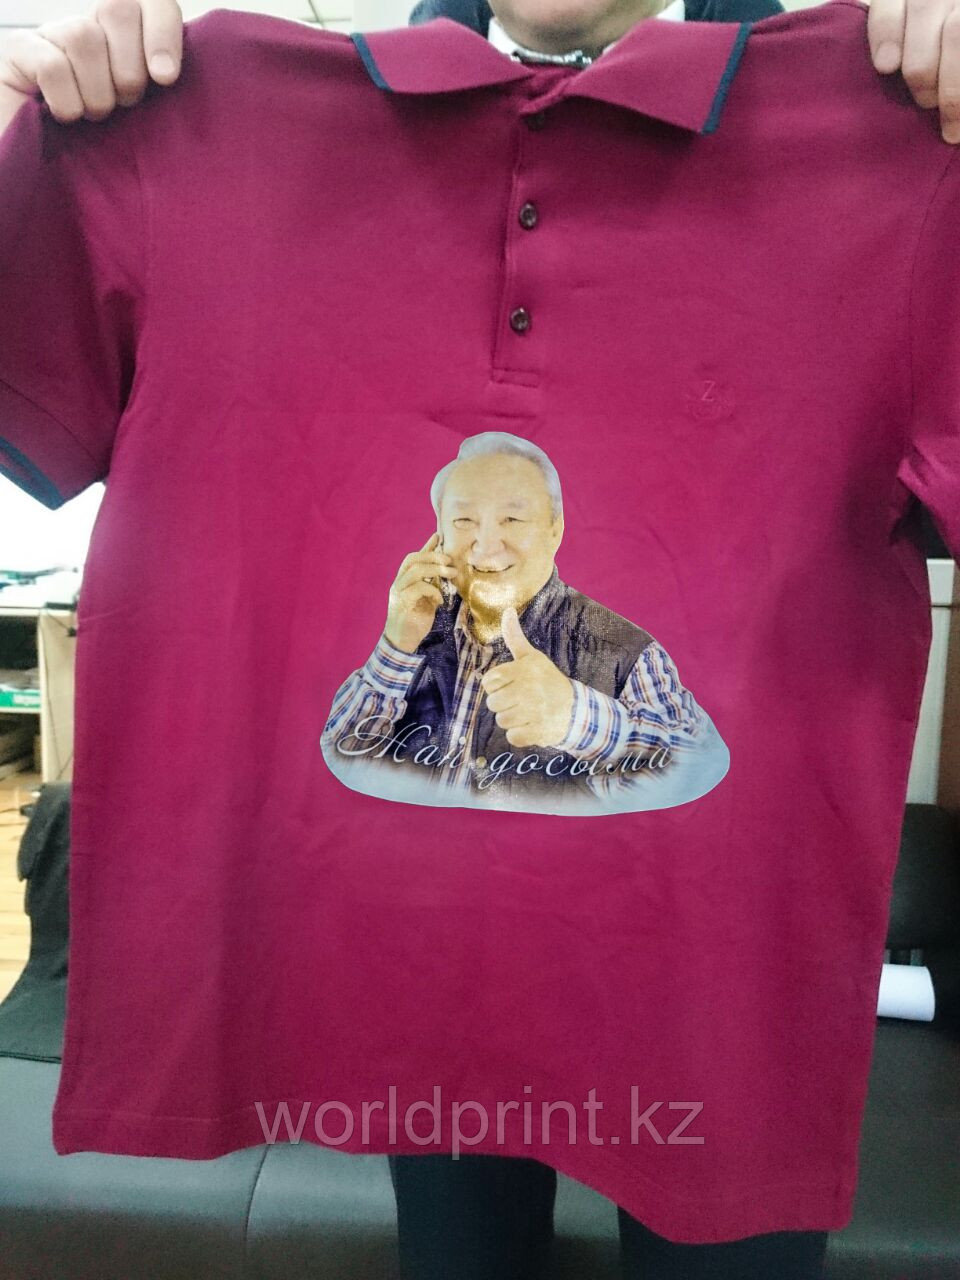 Нанесение фото на цветную футболку